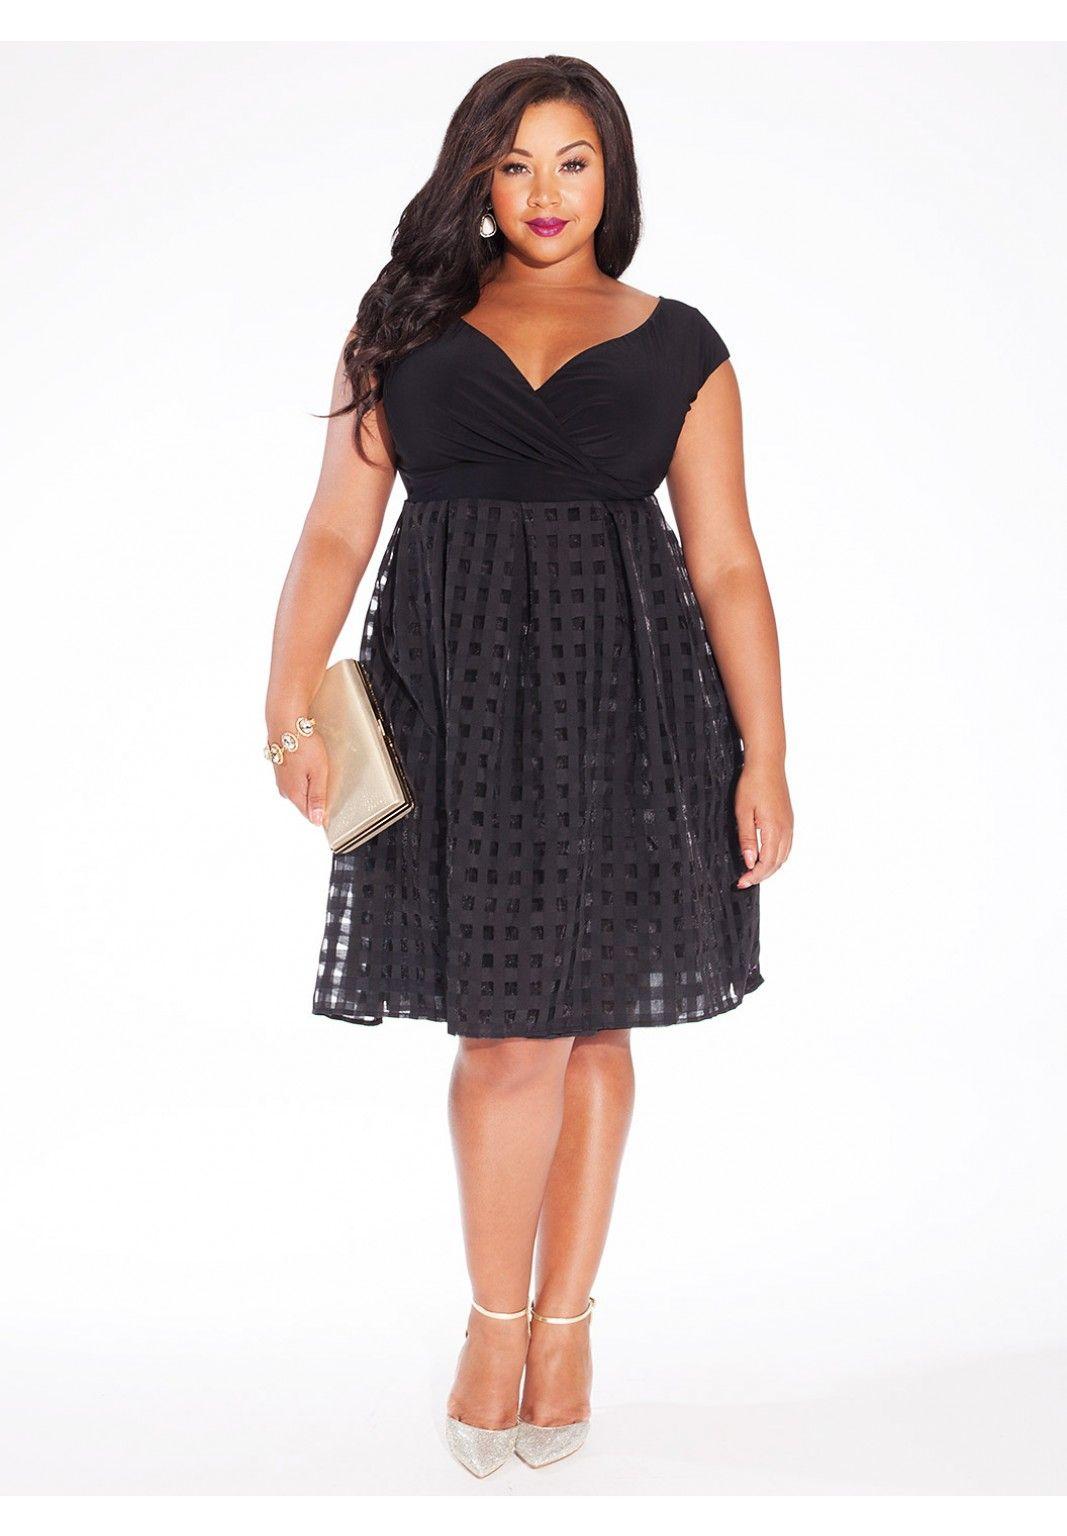 Adelle dress plus size special occasion shop onestopplus plus